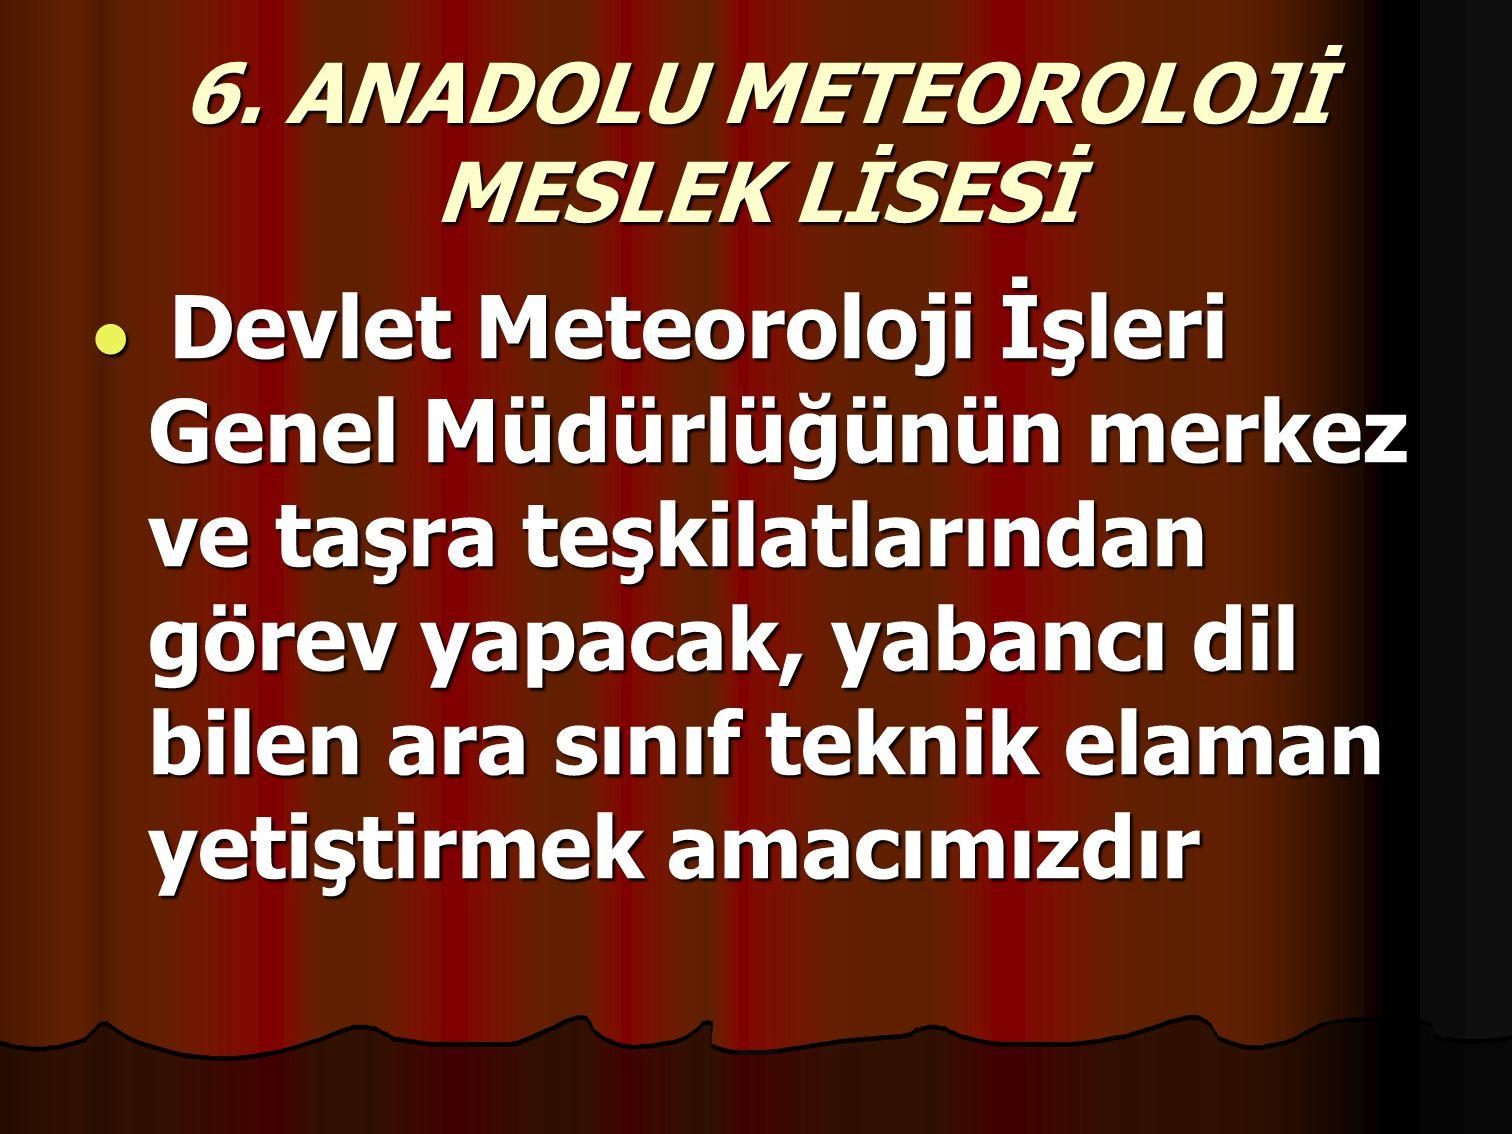 6. ANADOLU METEOROLOJİ MESLEK LİSESİ